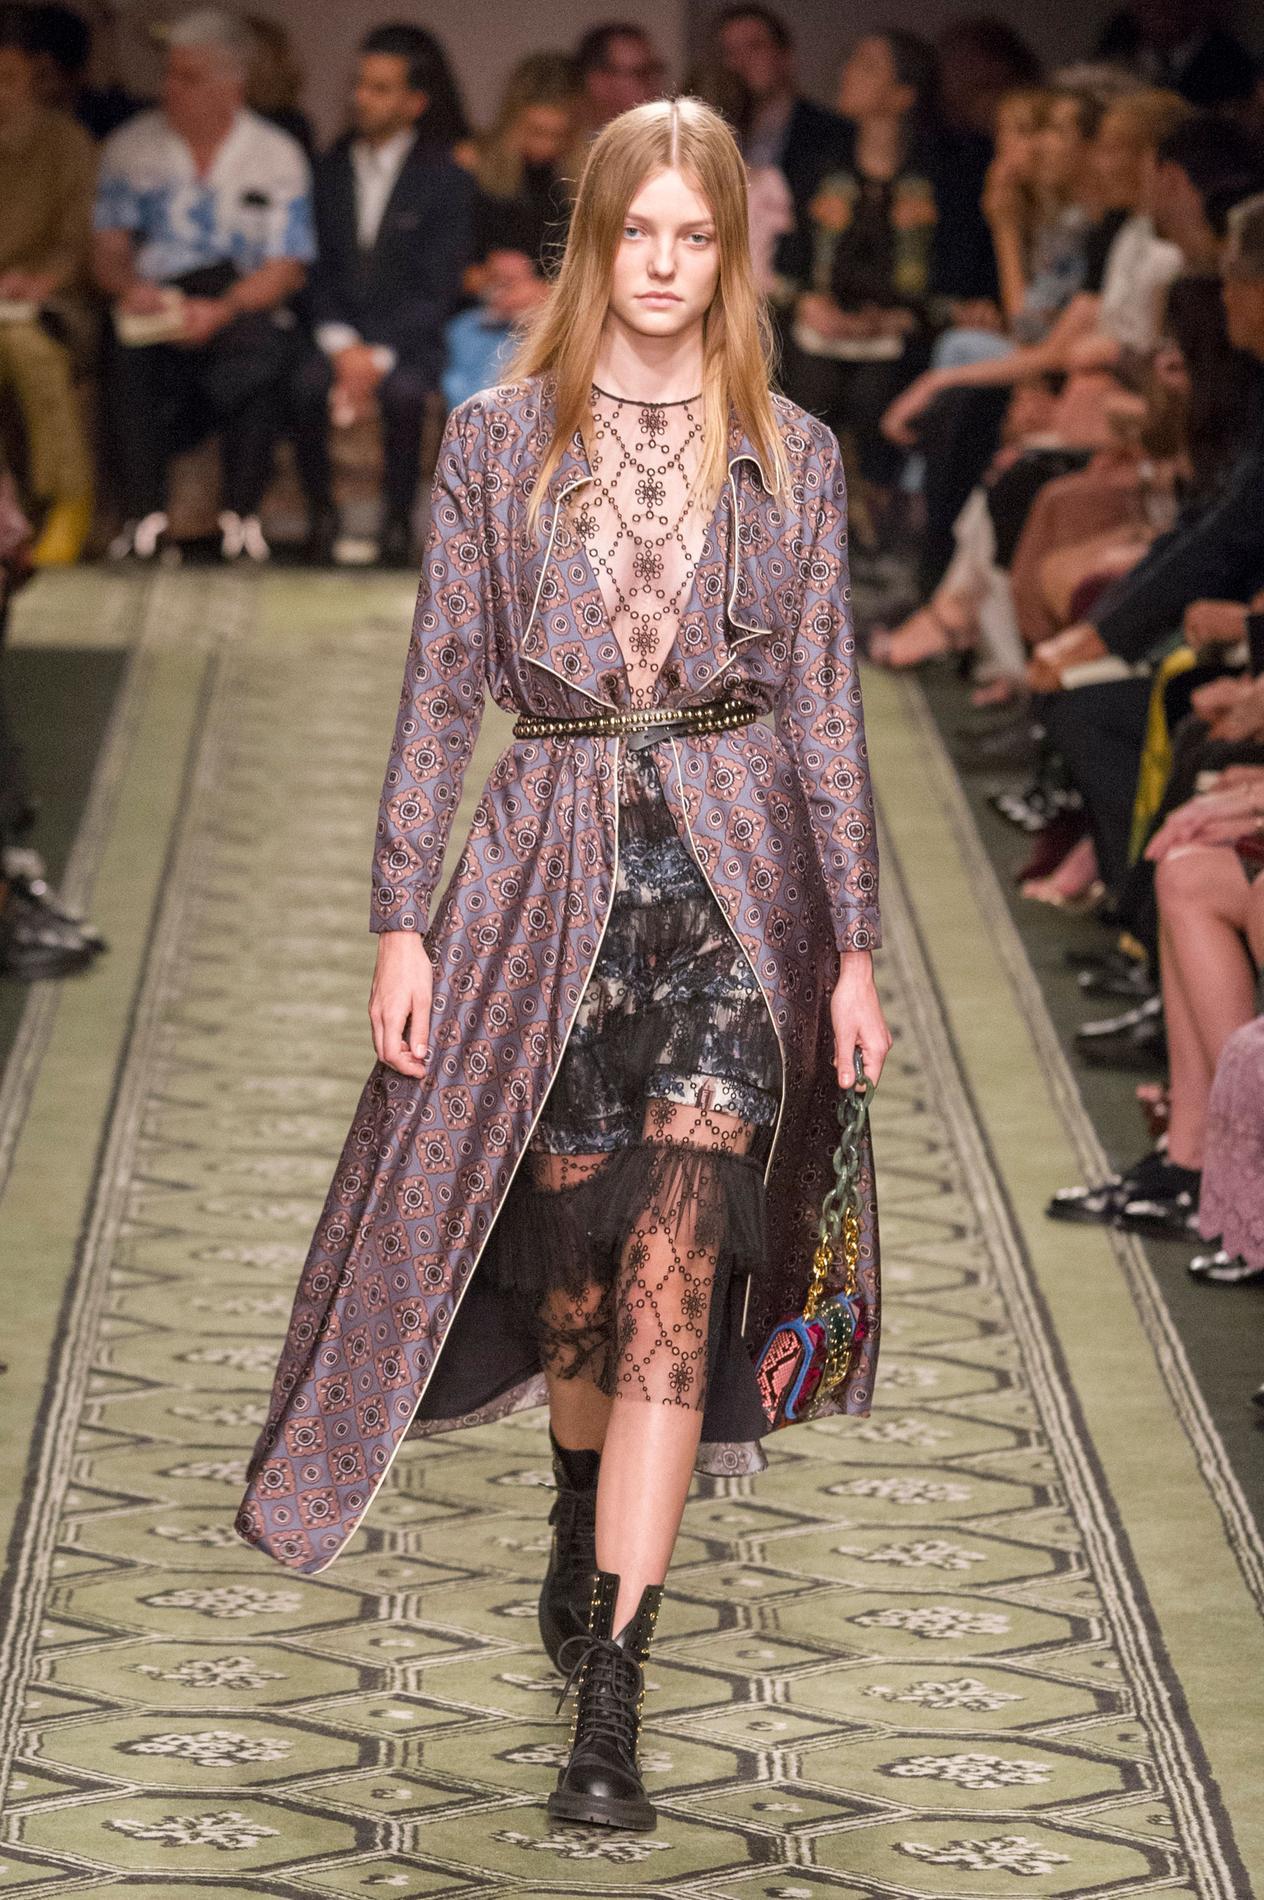 London Fashion Week - Designers 14